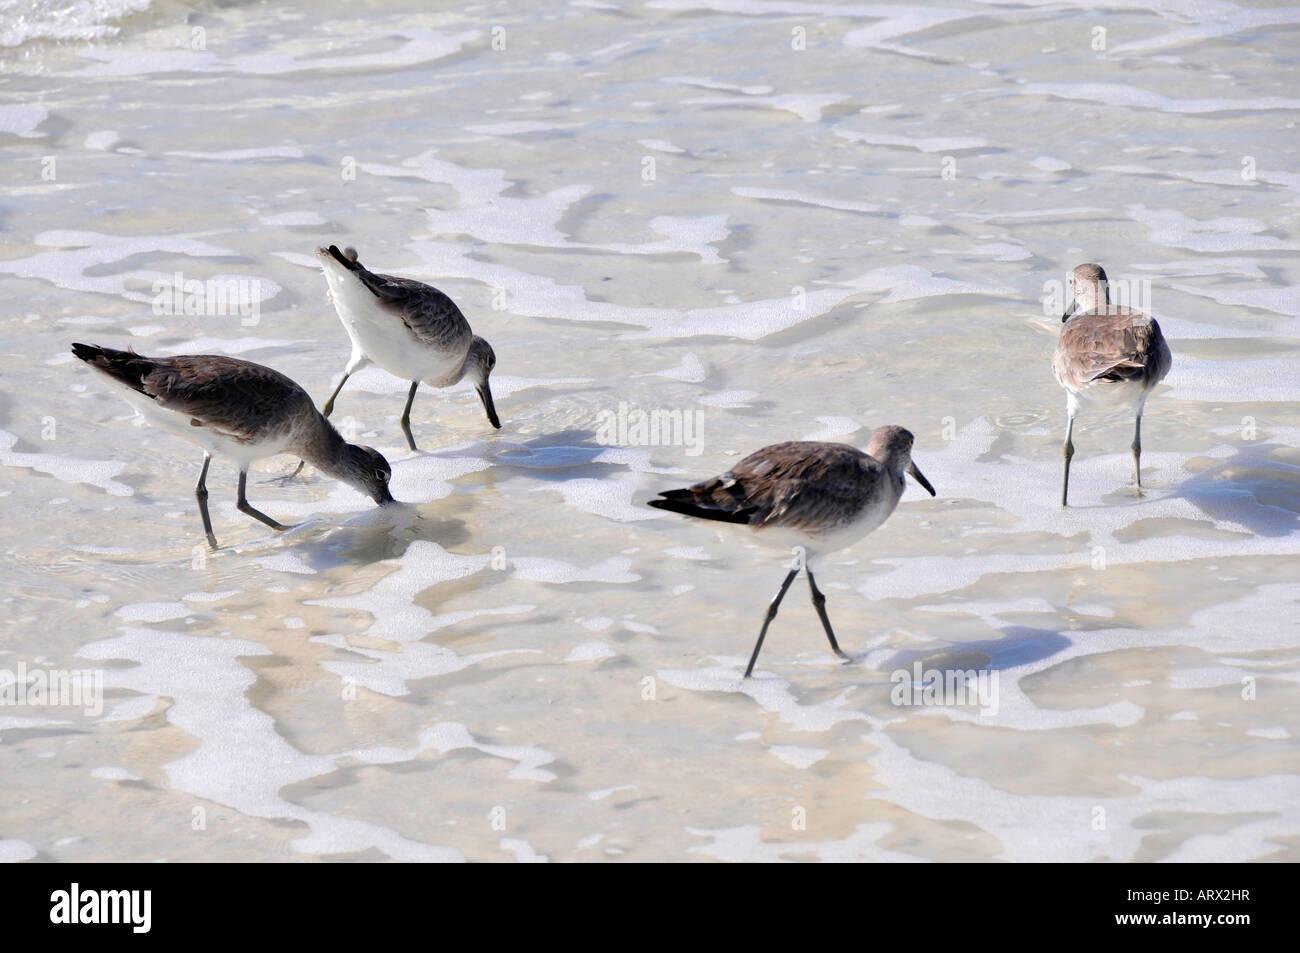 Willet Catoptrophorus semipalmatus Florida water shore bird search out food - Stock Image